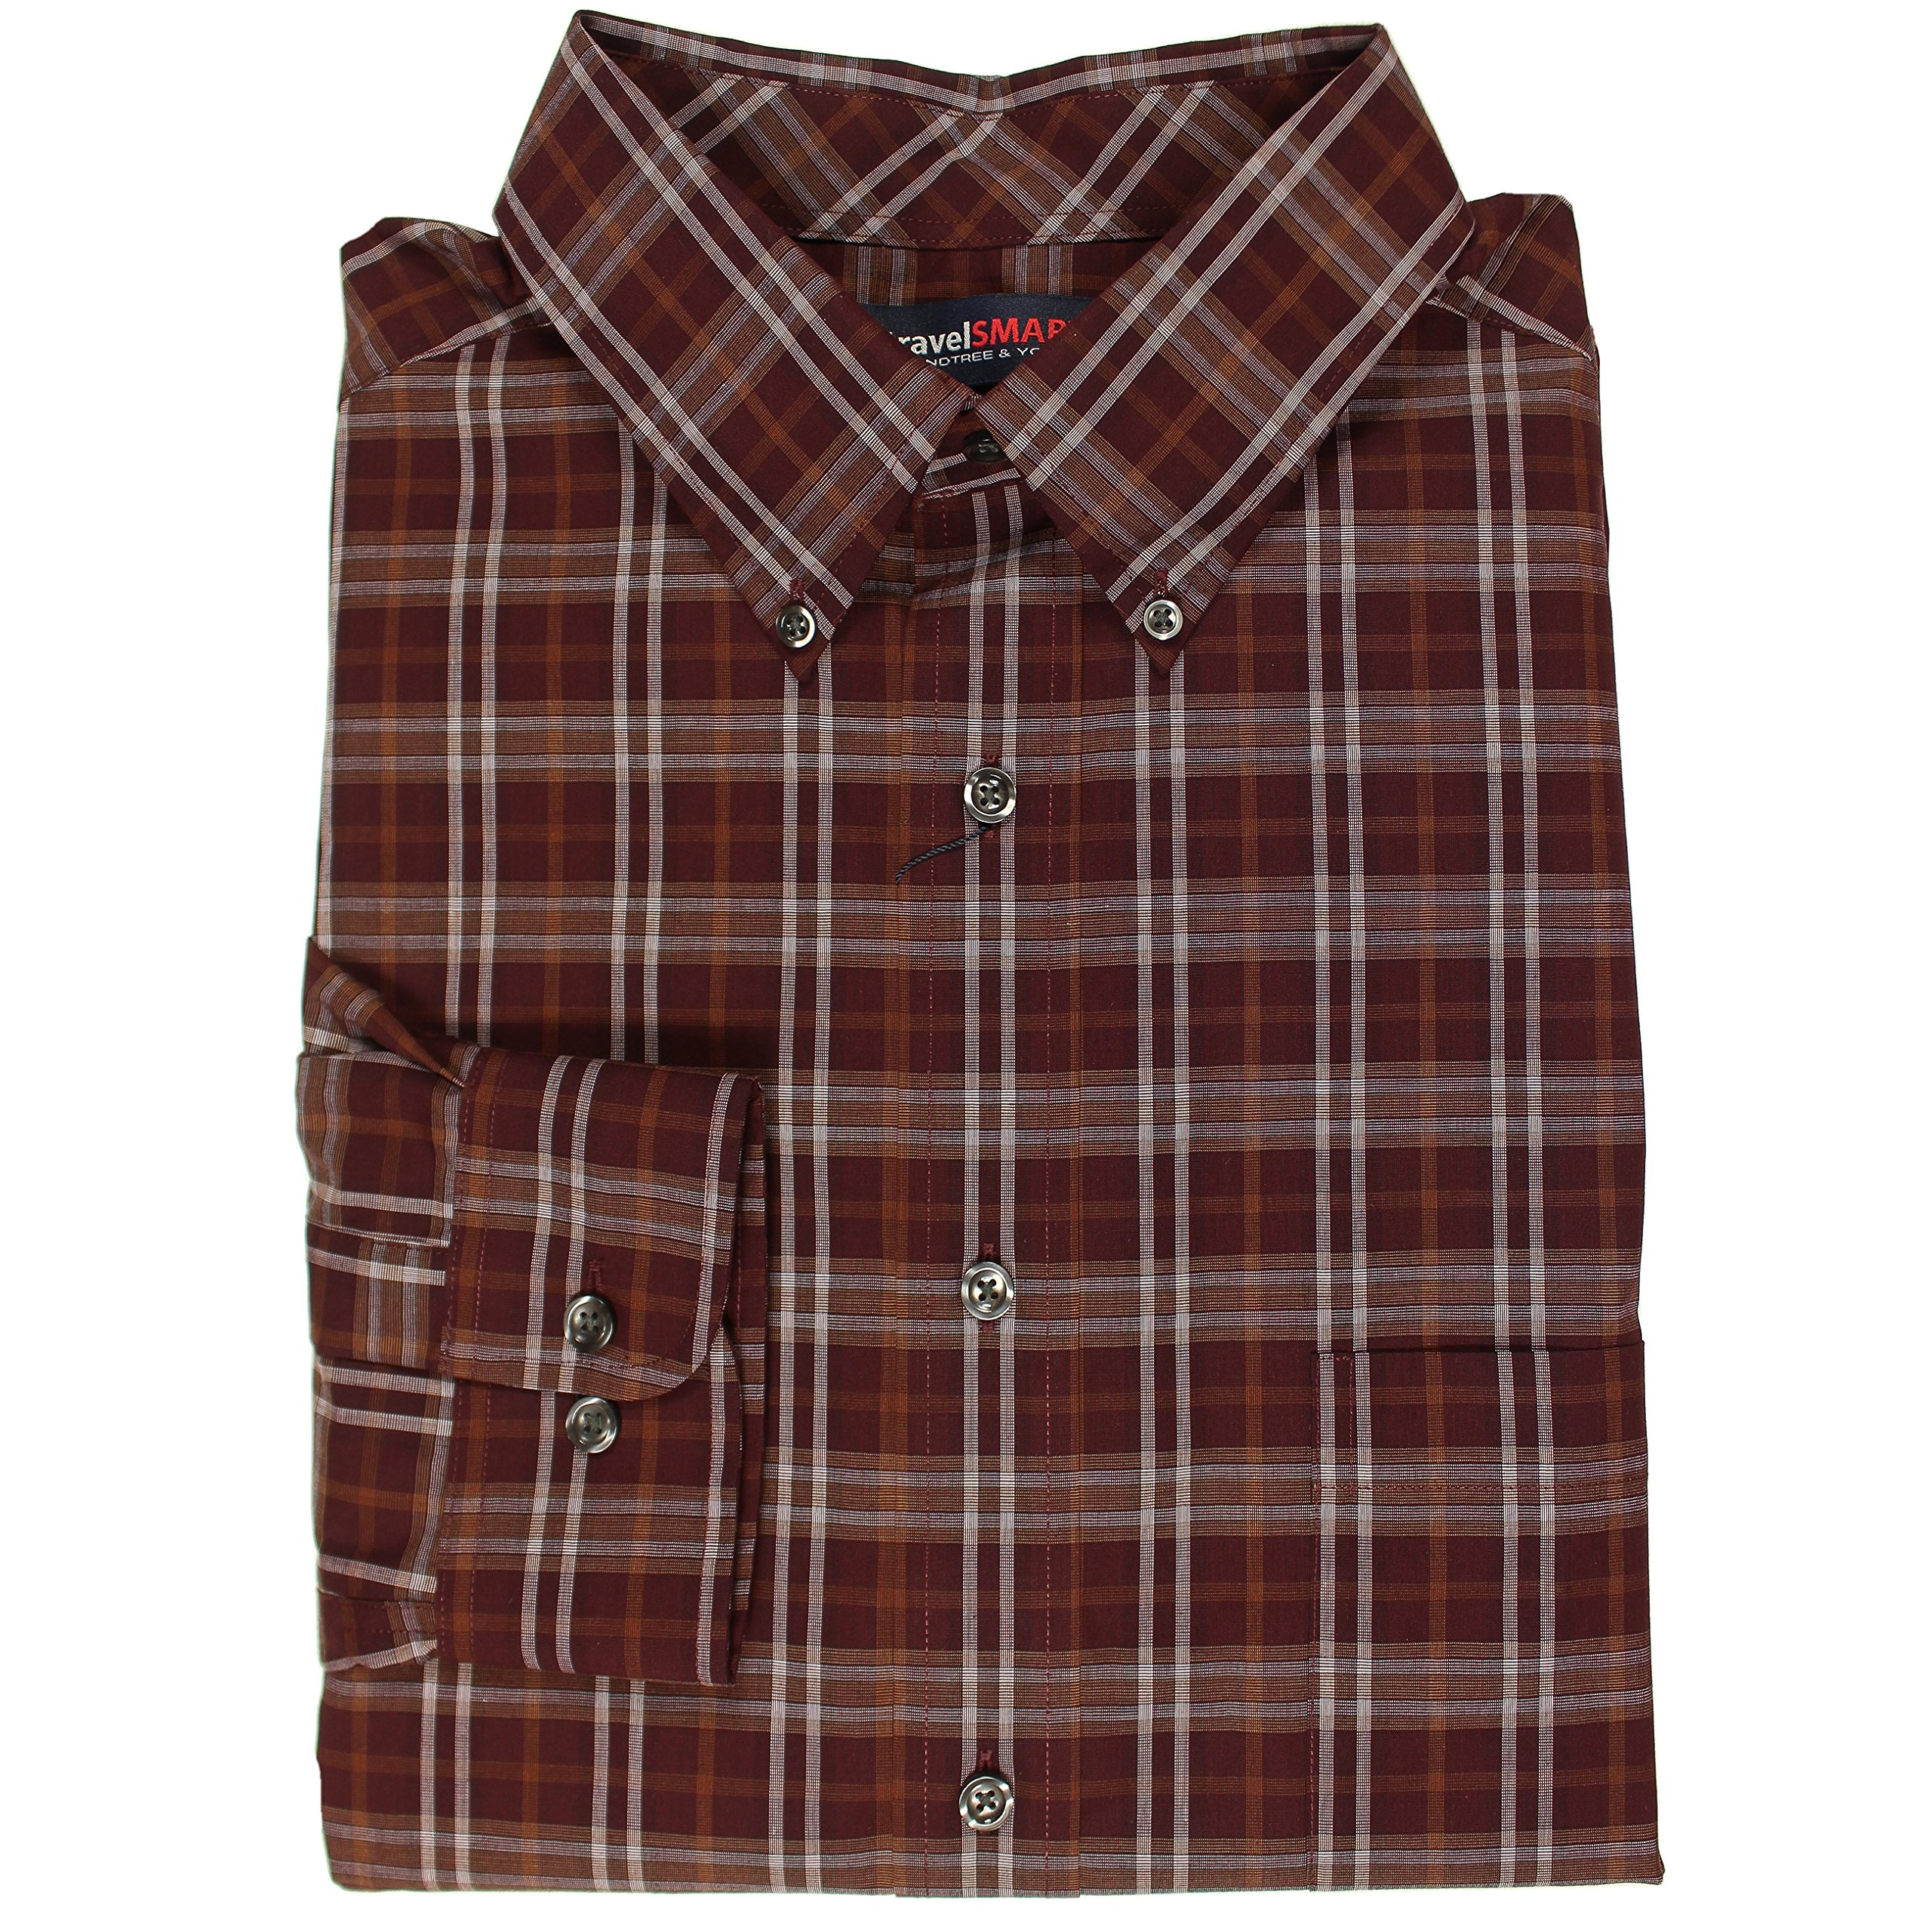 Roundtree & Yorke TravelSMART Wrinkle Resistant Easy-Care Men's Big & Tall Long Sleeve Shirt (Burgundy Windowpane Plaid, 3X Big)